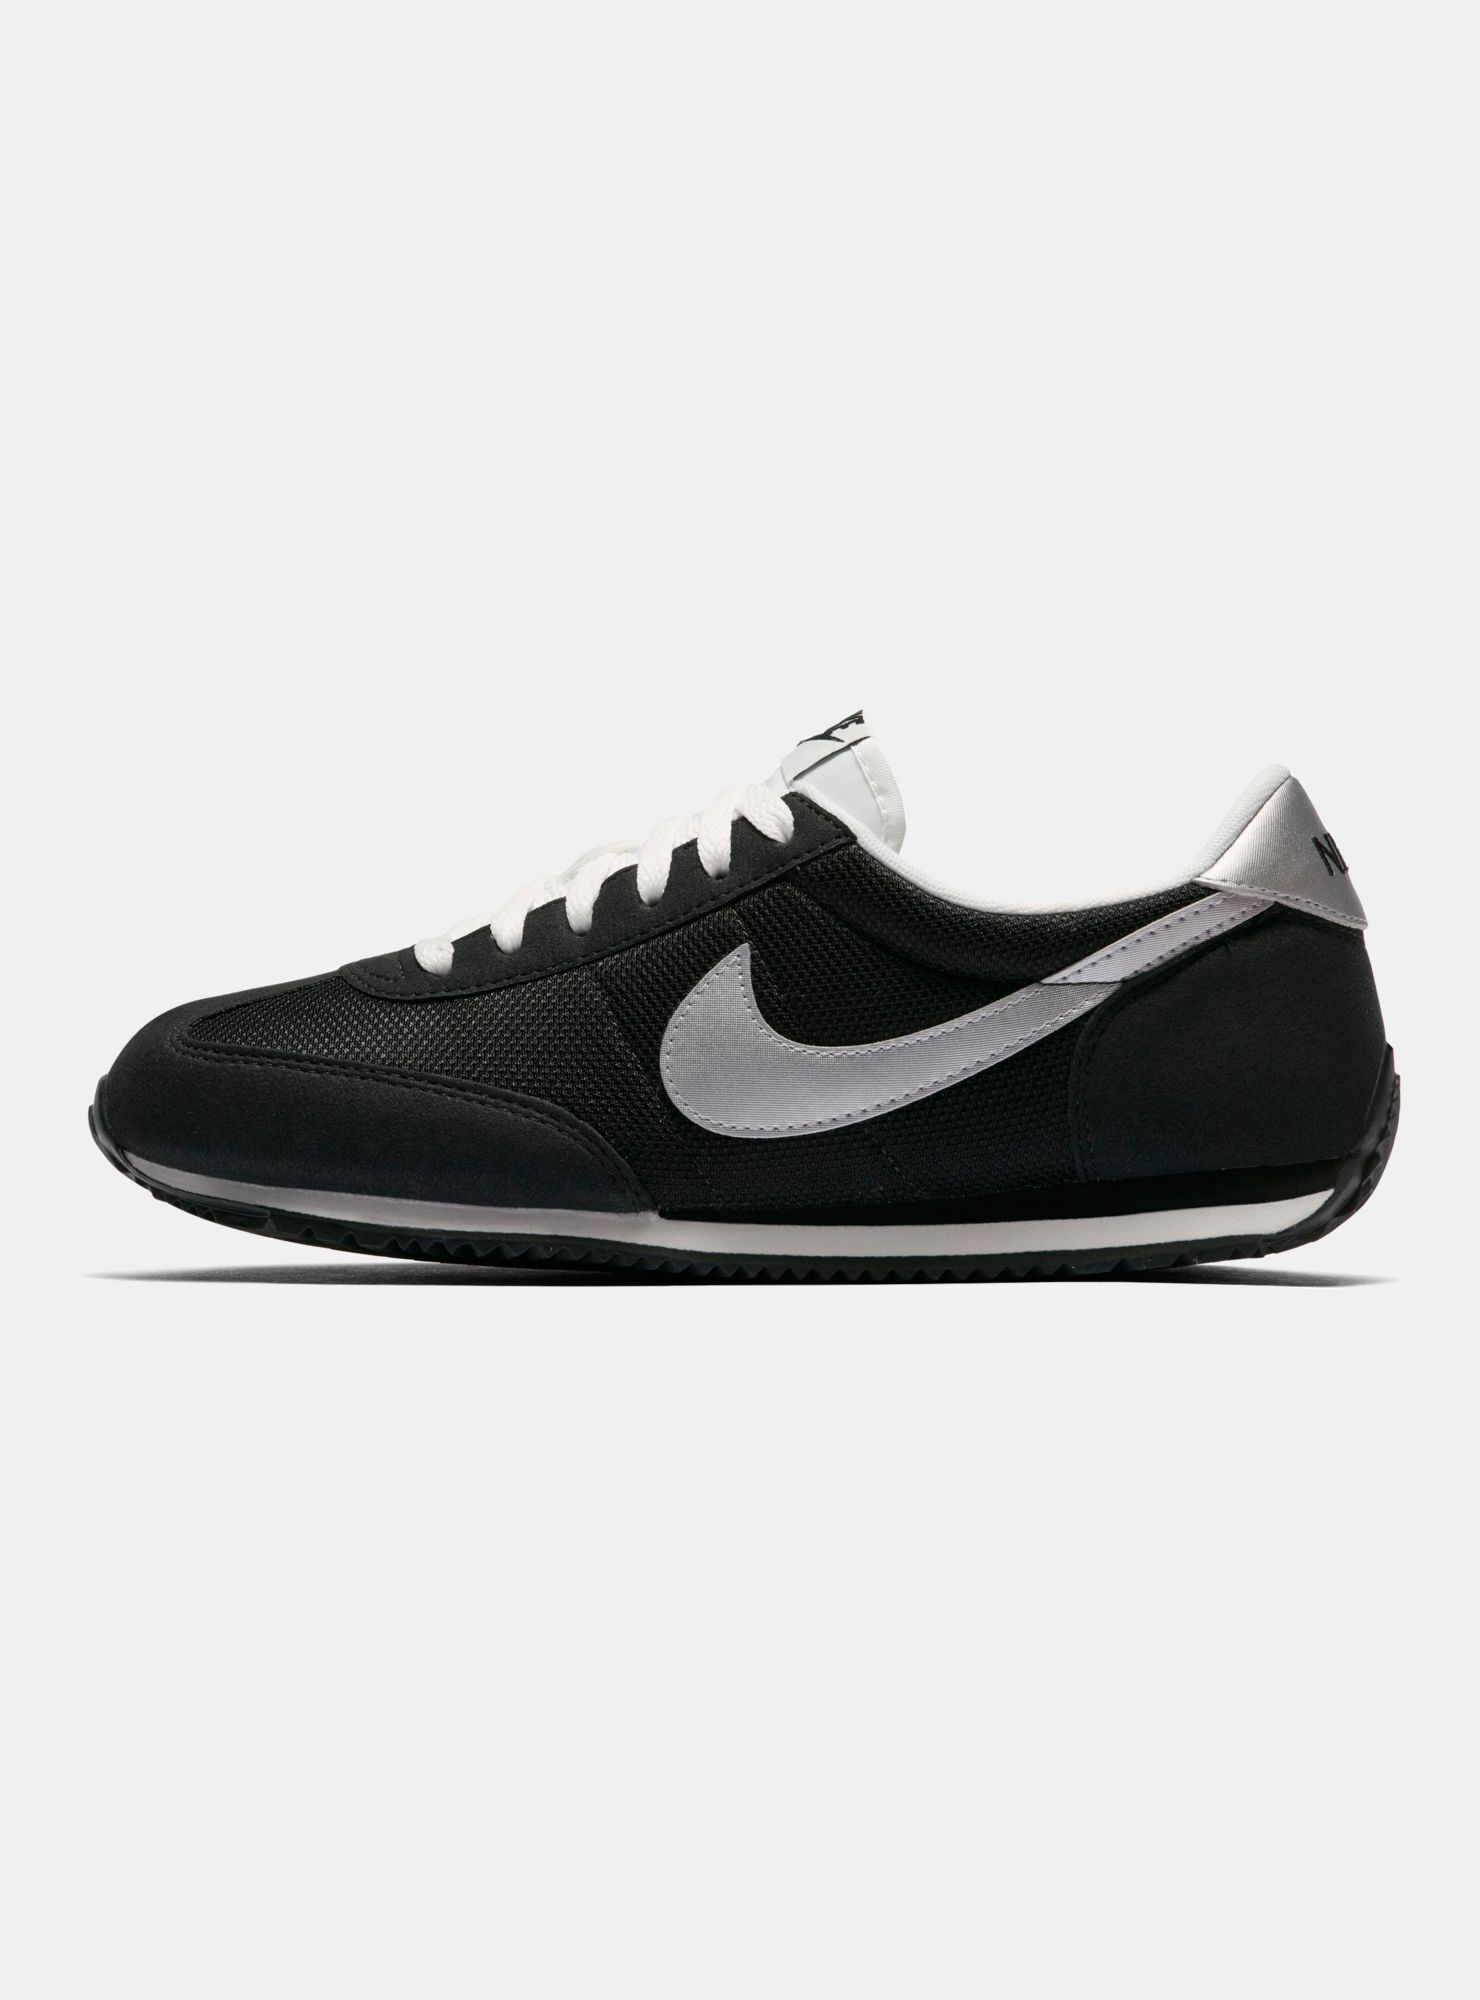 dd3f4ddcef951 Zapatilla Nike Oceania Textile Urbana Mujer - Zapatillas